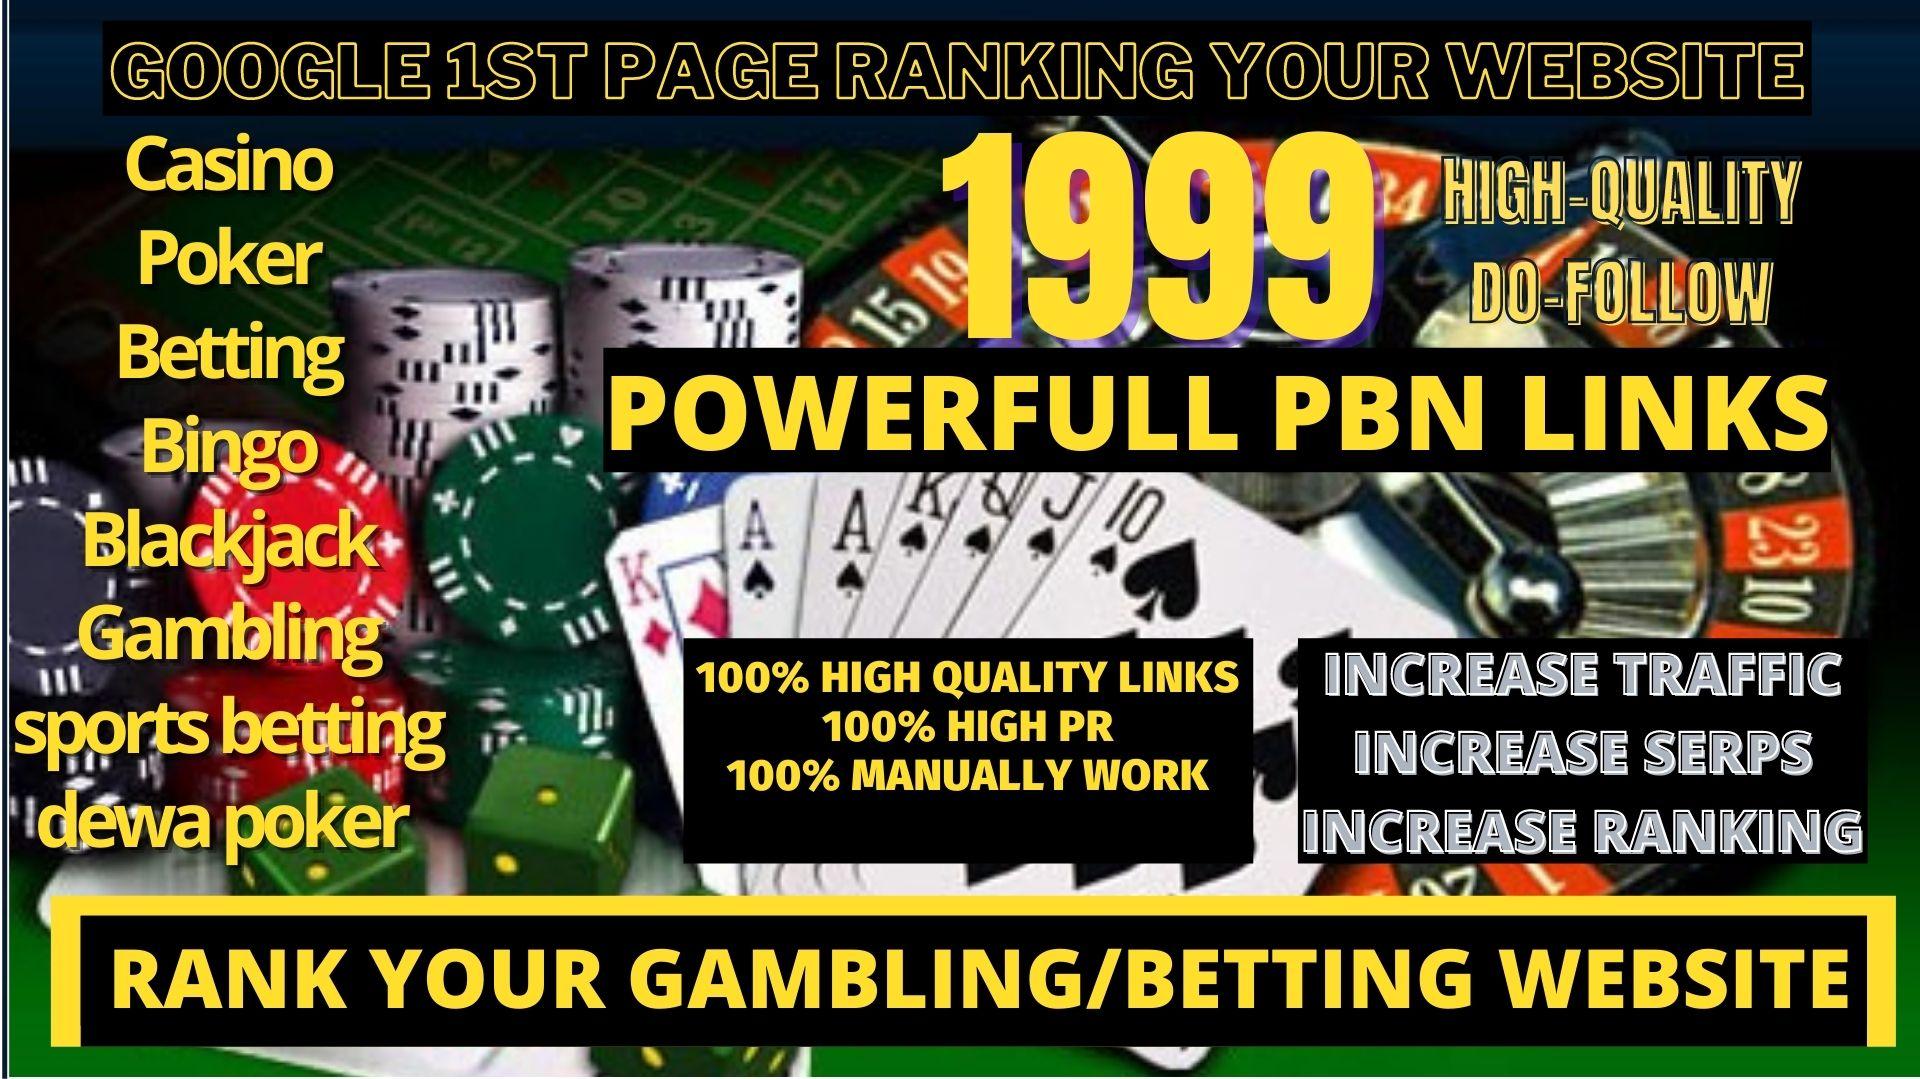 1999+Parmanent CASINO/POKER/Gambling/Sports Betting/judi bola related unique site